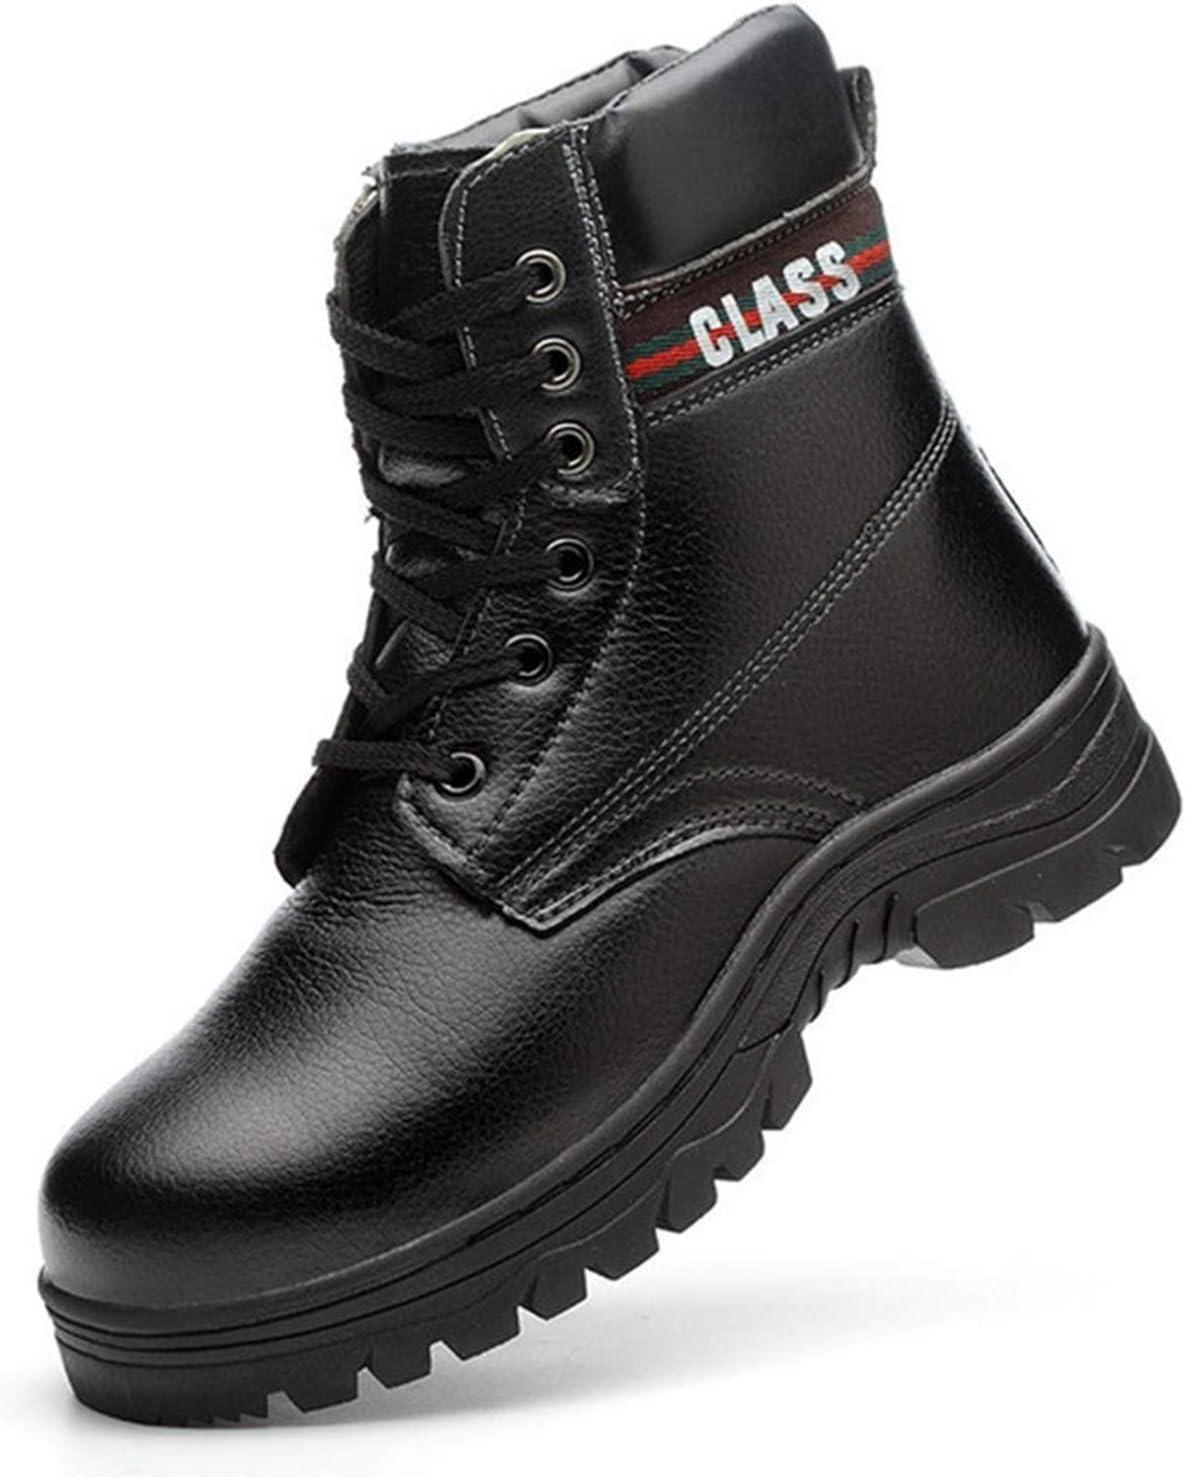 Winter Safety Shoes for Men Steel Sale SALE% OFF Regular discount Air Lightweight Cushion Women